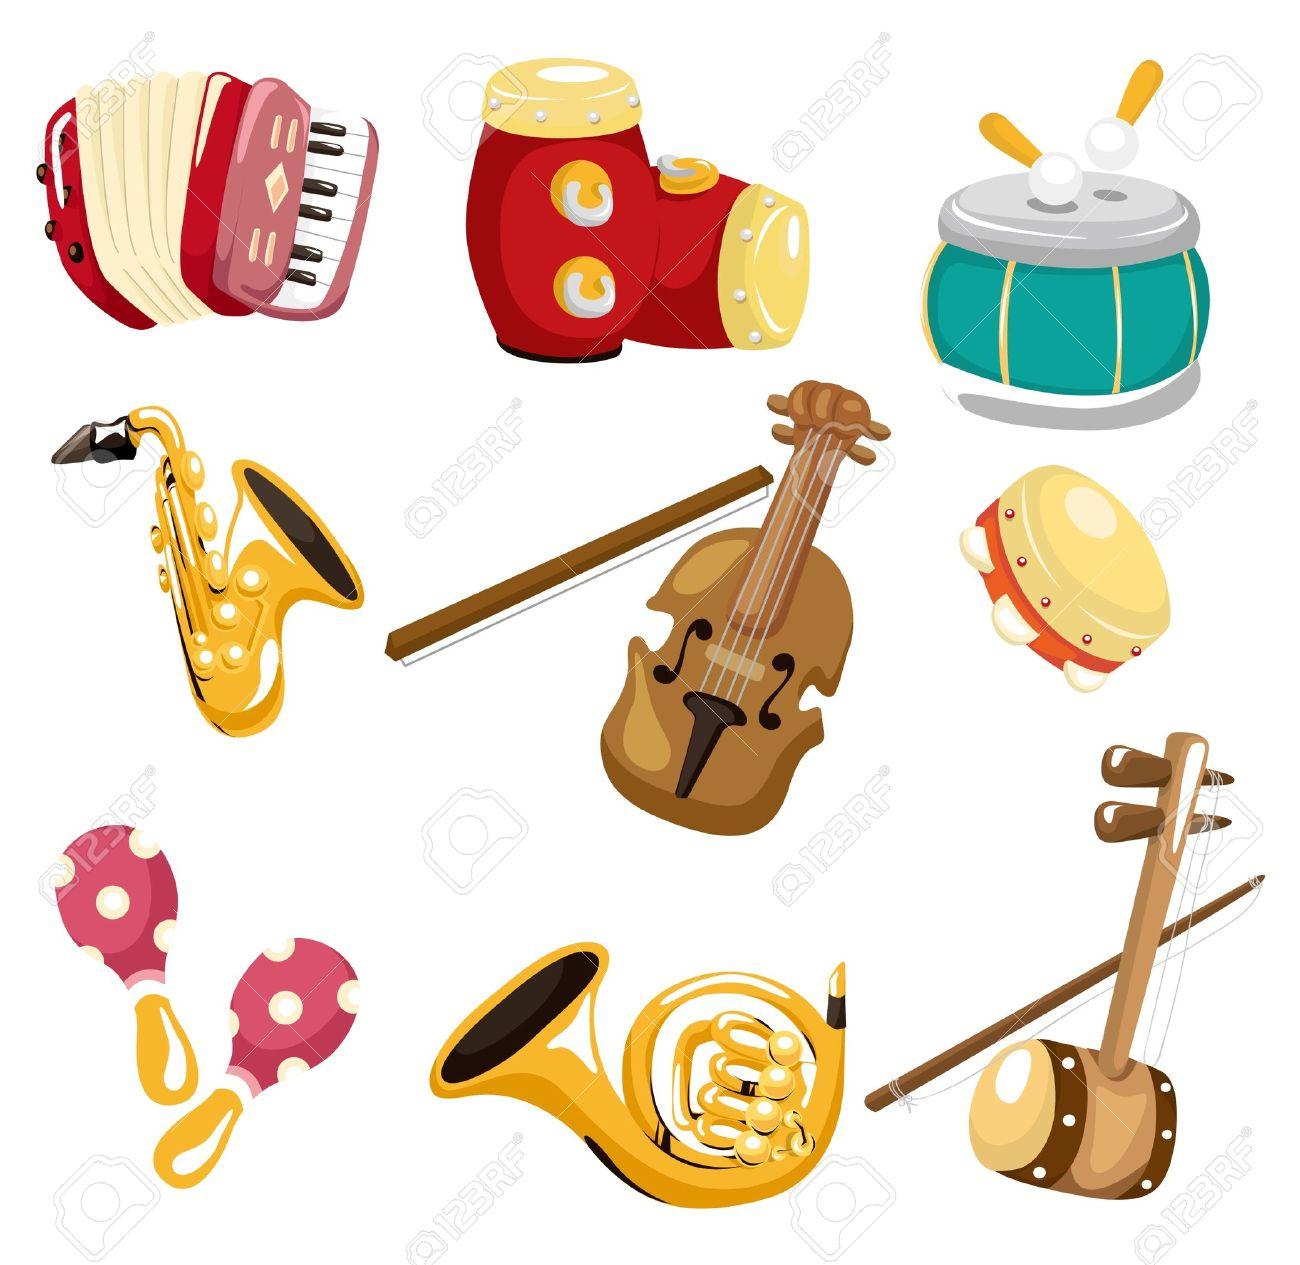 cartoon musical instrument icon - 8927619